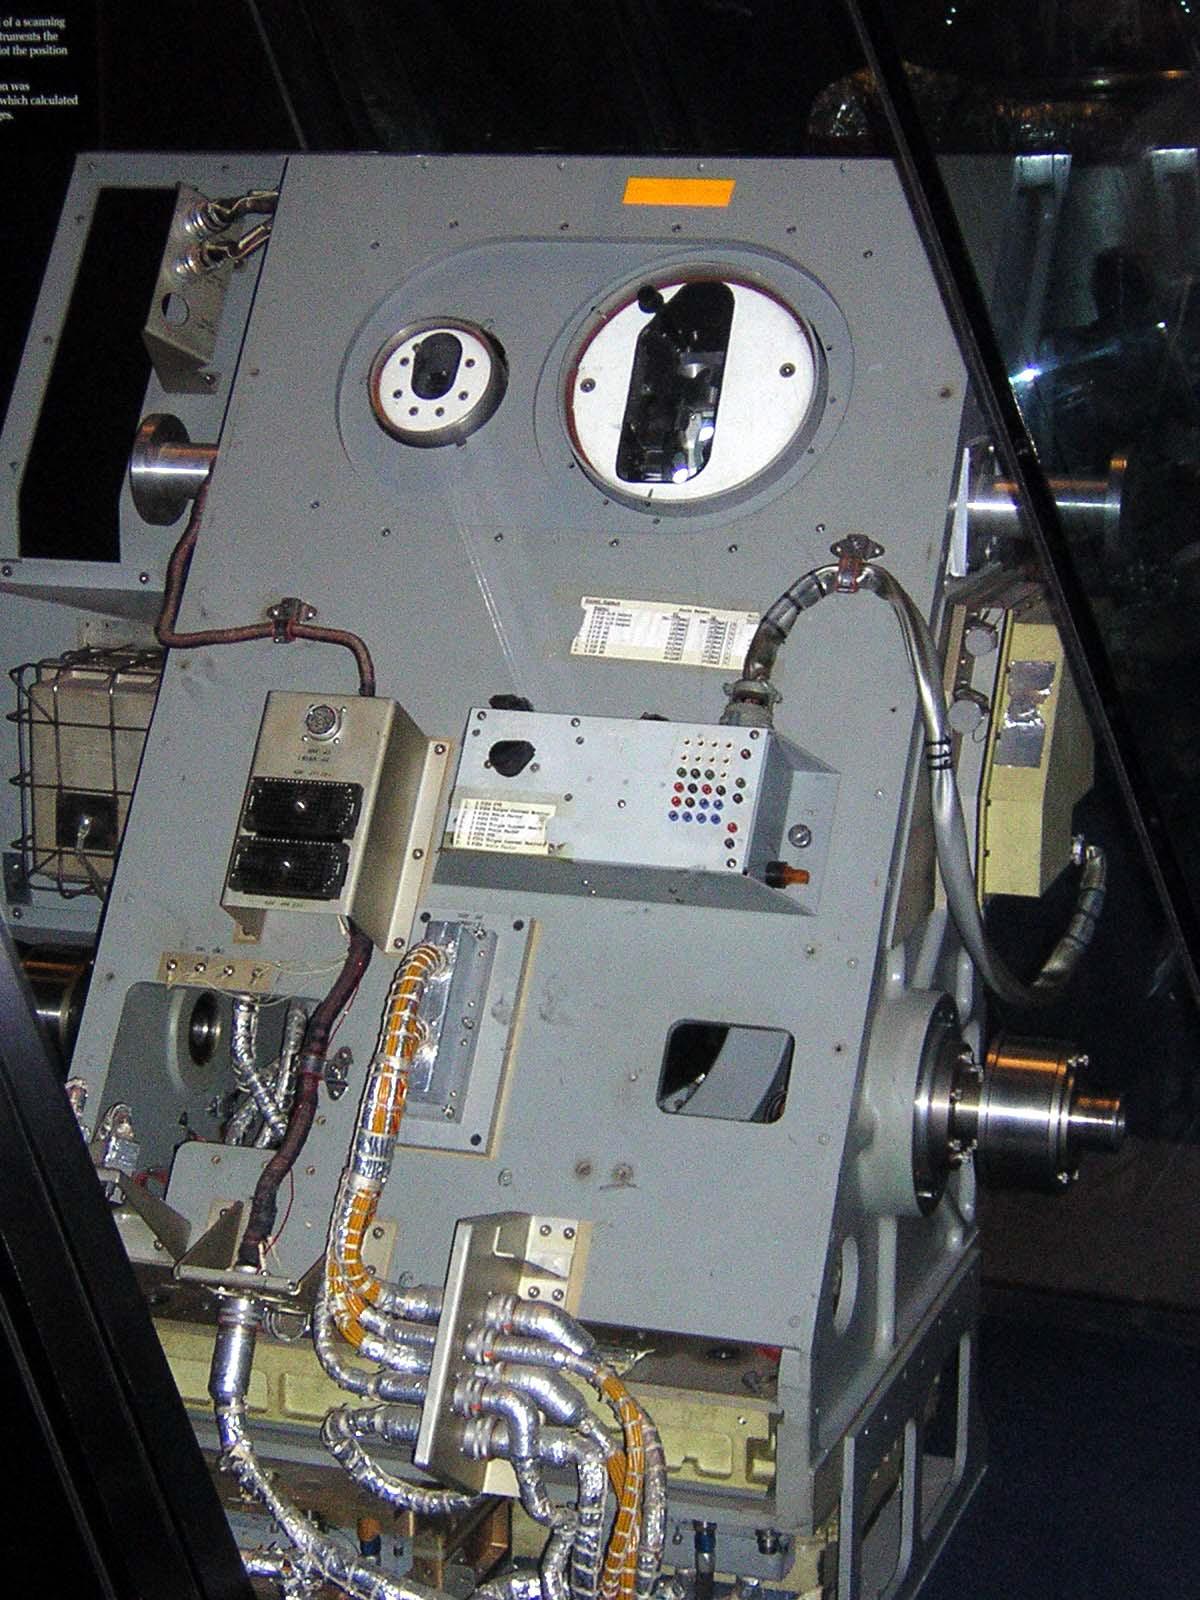 apollo spacecraft guidance system - photo #5